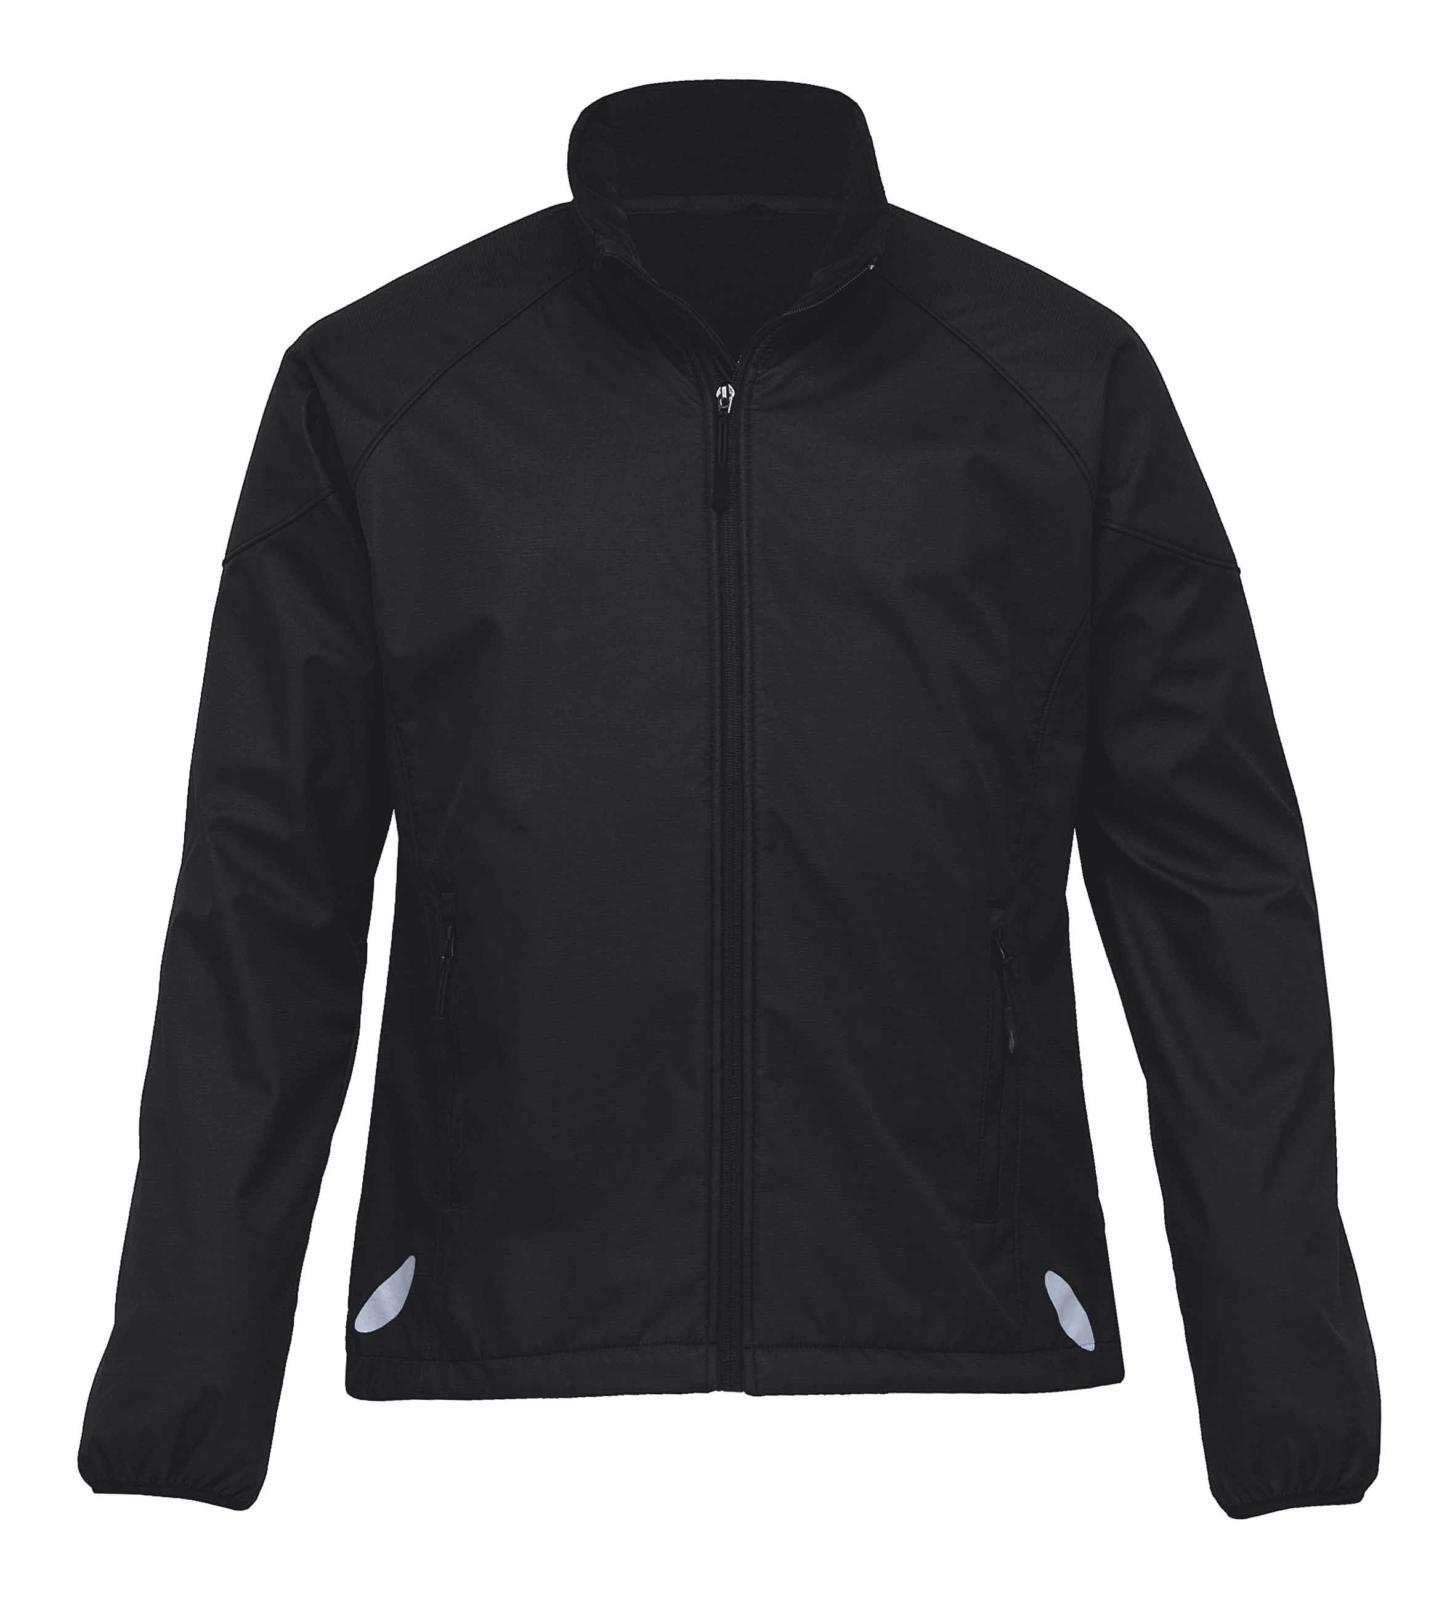 Traverse Jacket